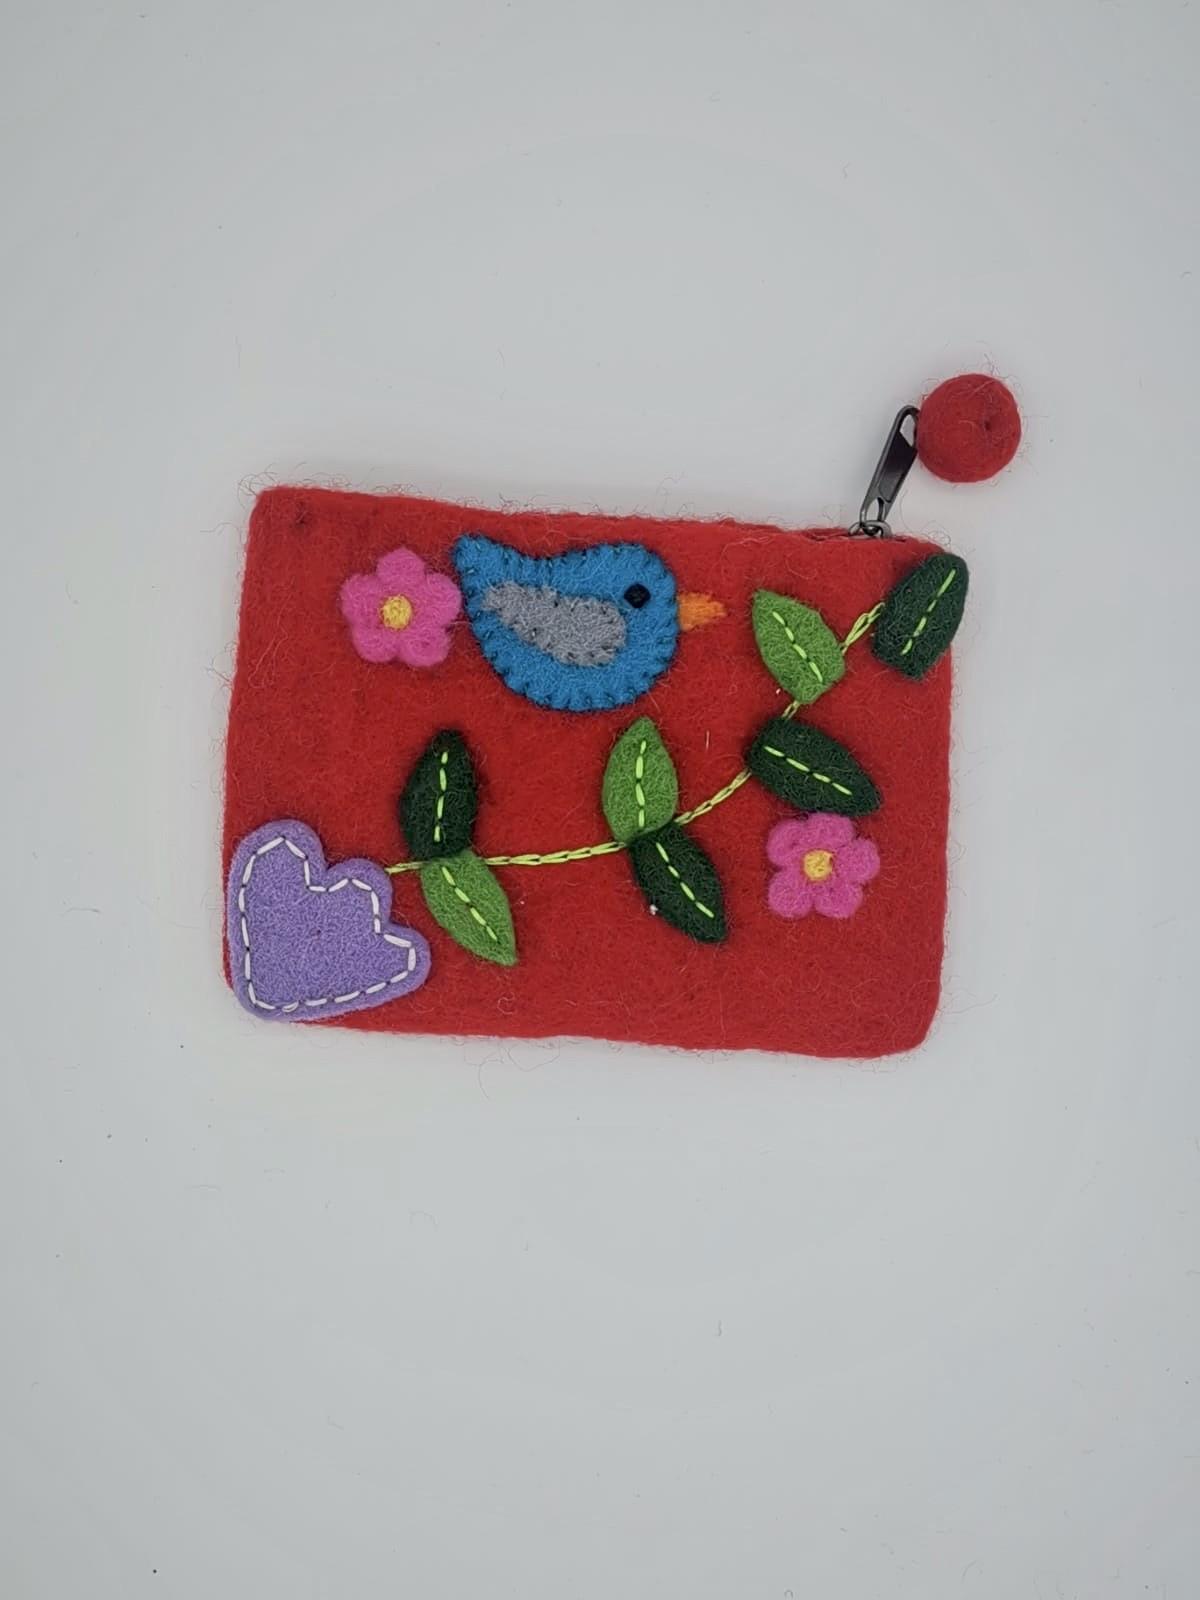 Portofel din fetru rosu cu aplicatii multicolore